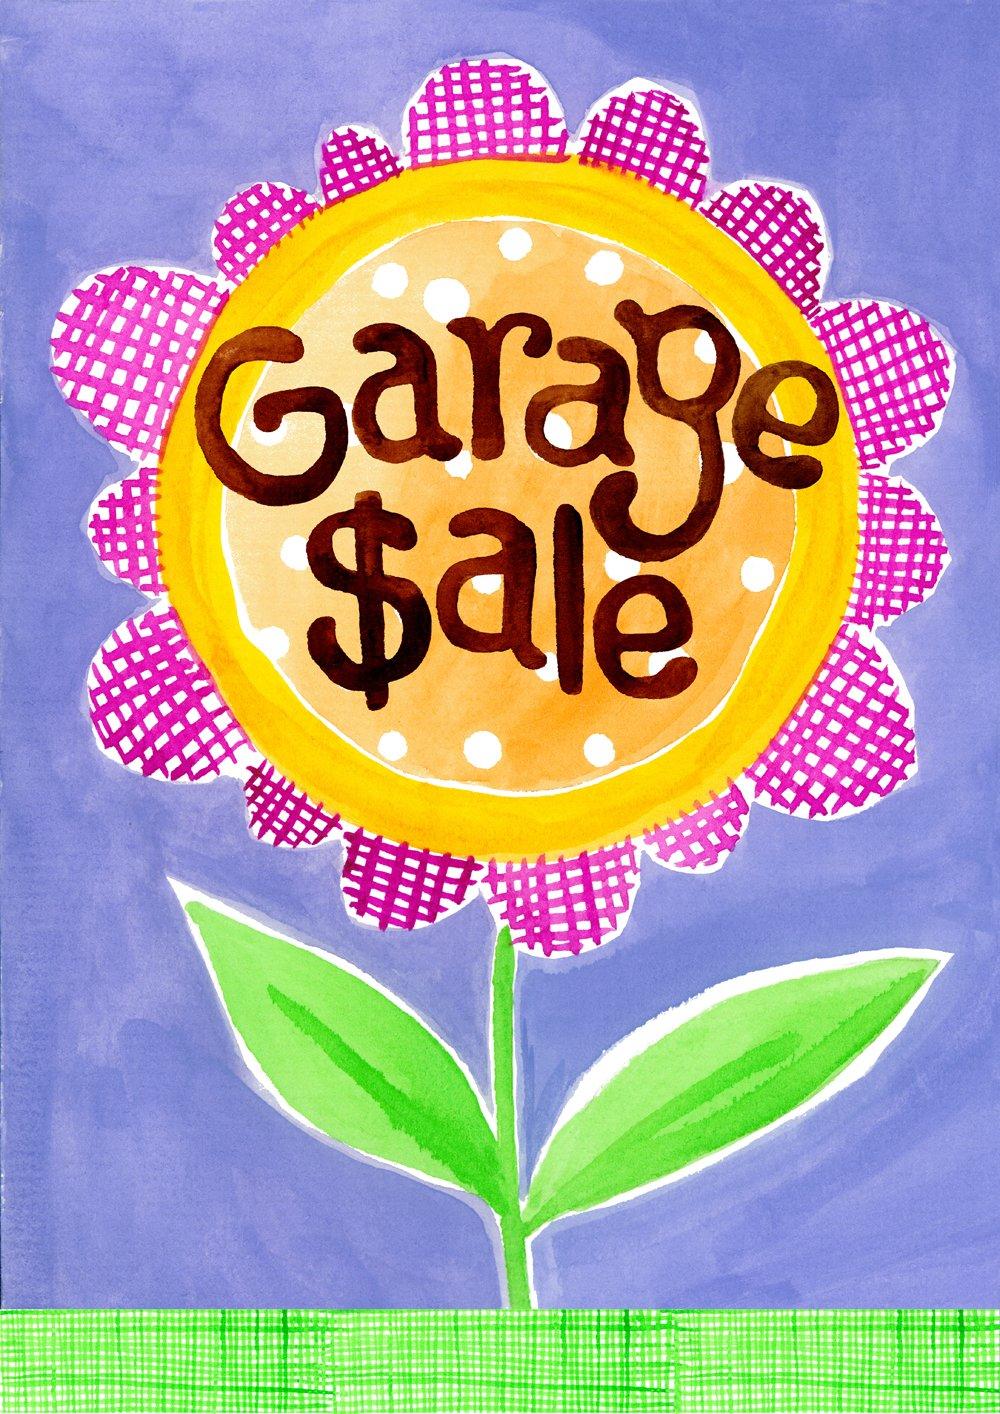 Toland Home Garden Garage Sale 12.5 x 18 Inch Decorative Colorful Flower Estate Yard for Sale Sign Garden Flag